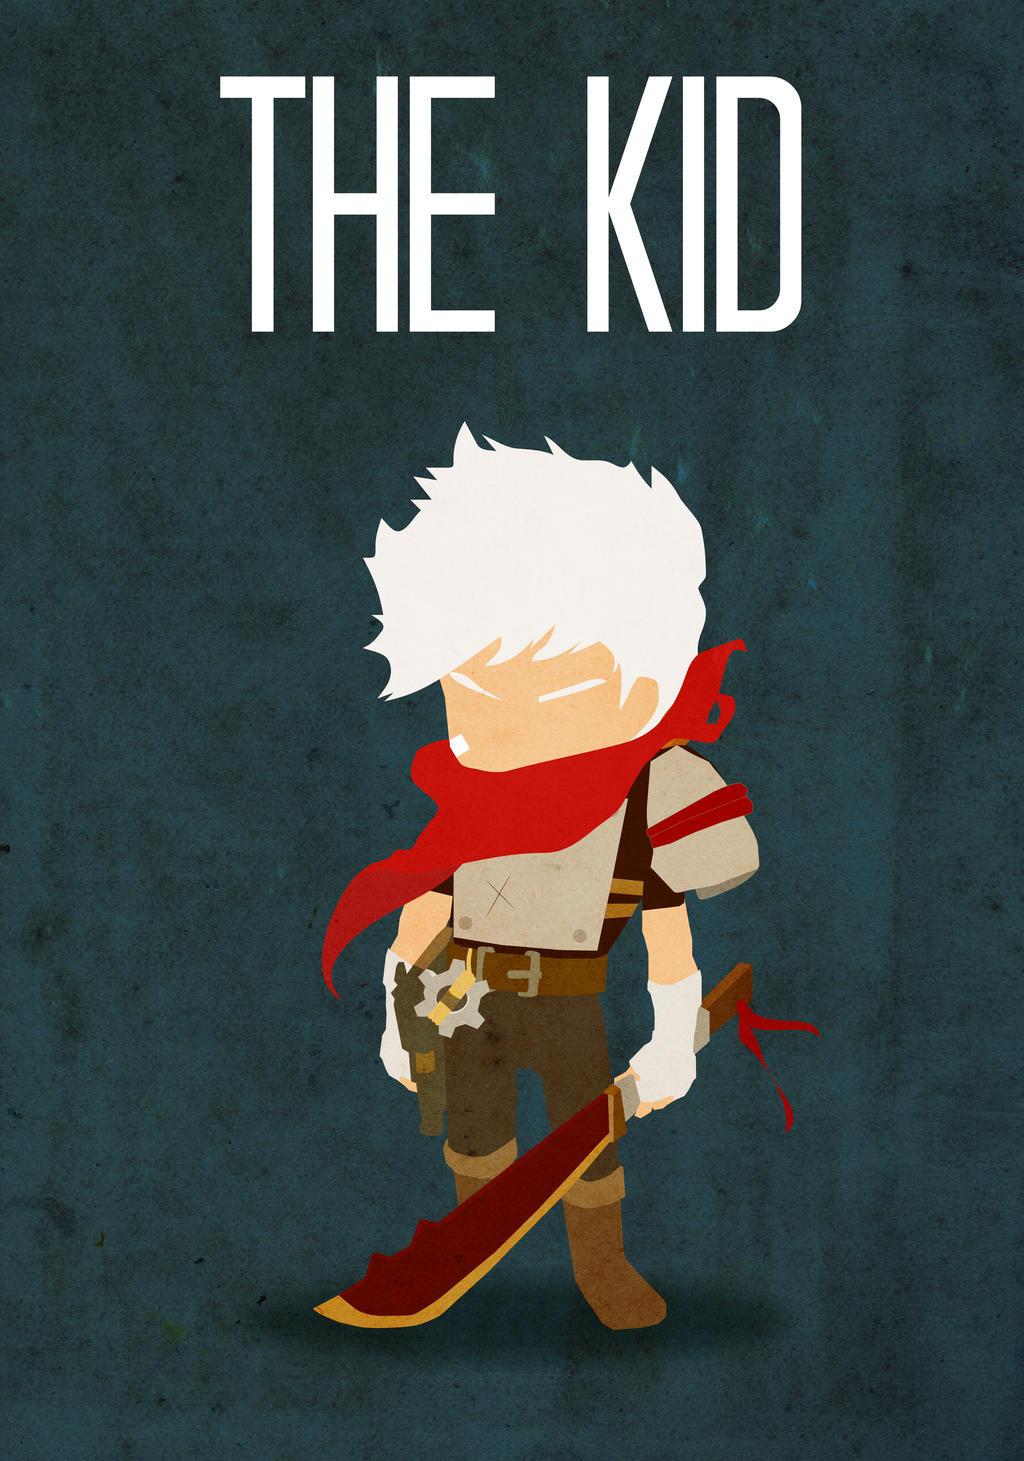 Bastion The Kid by Procastinating on DeviantArt